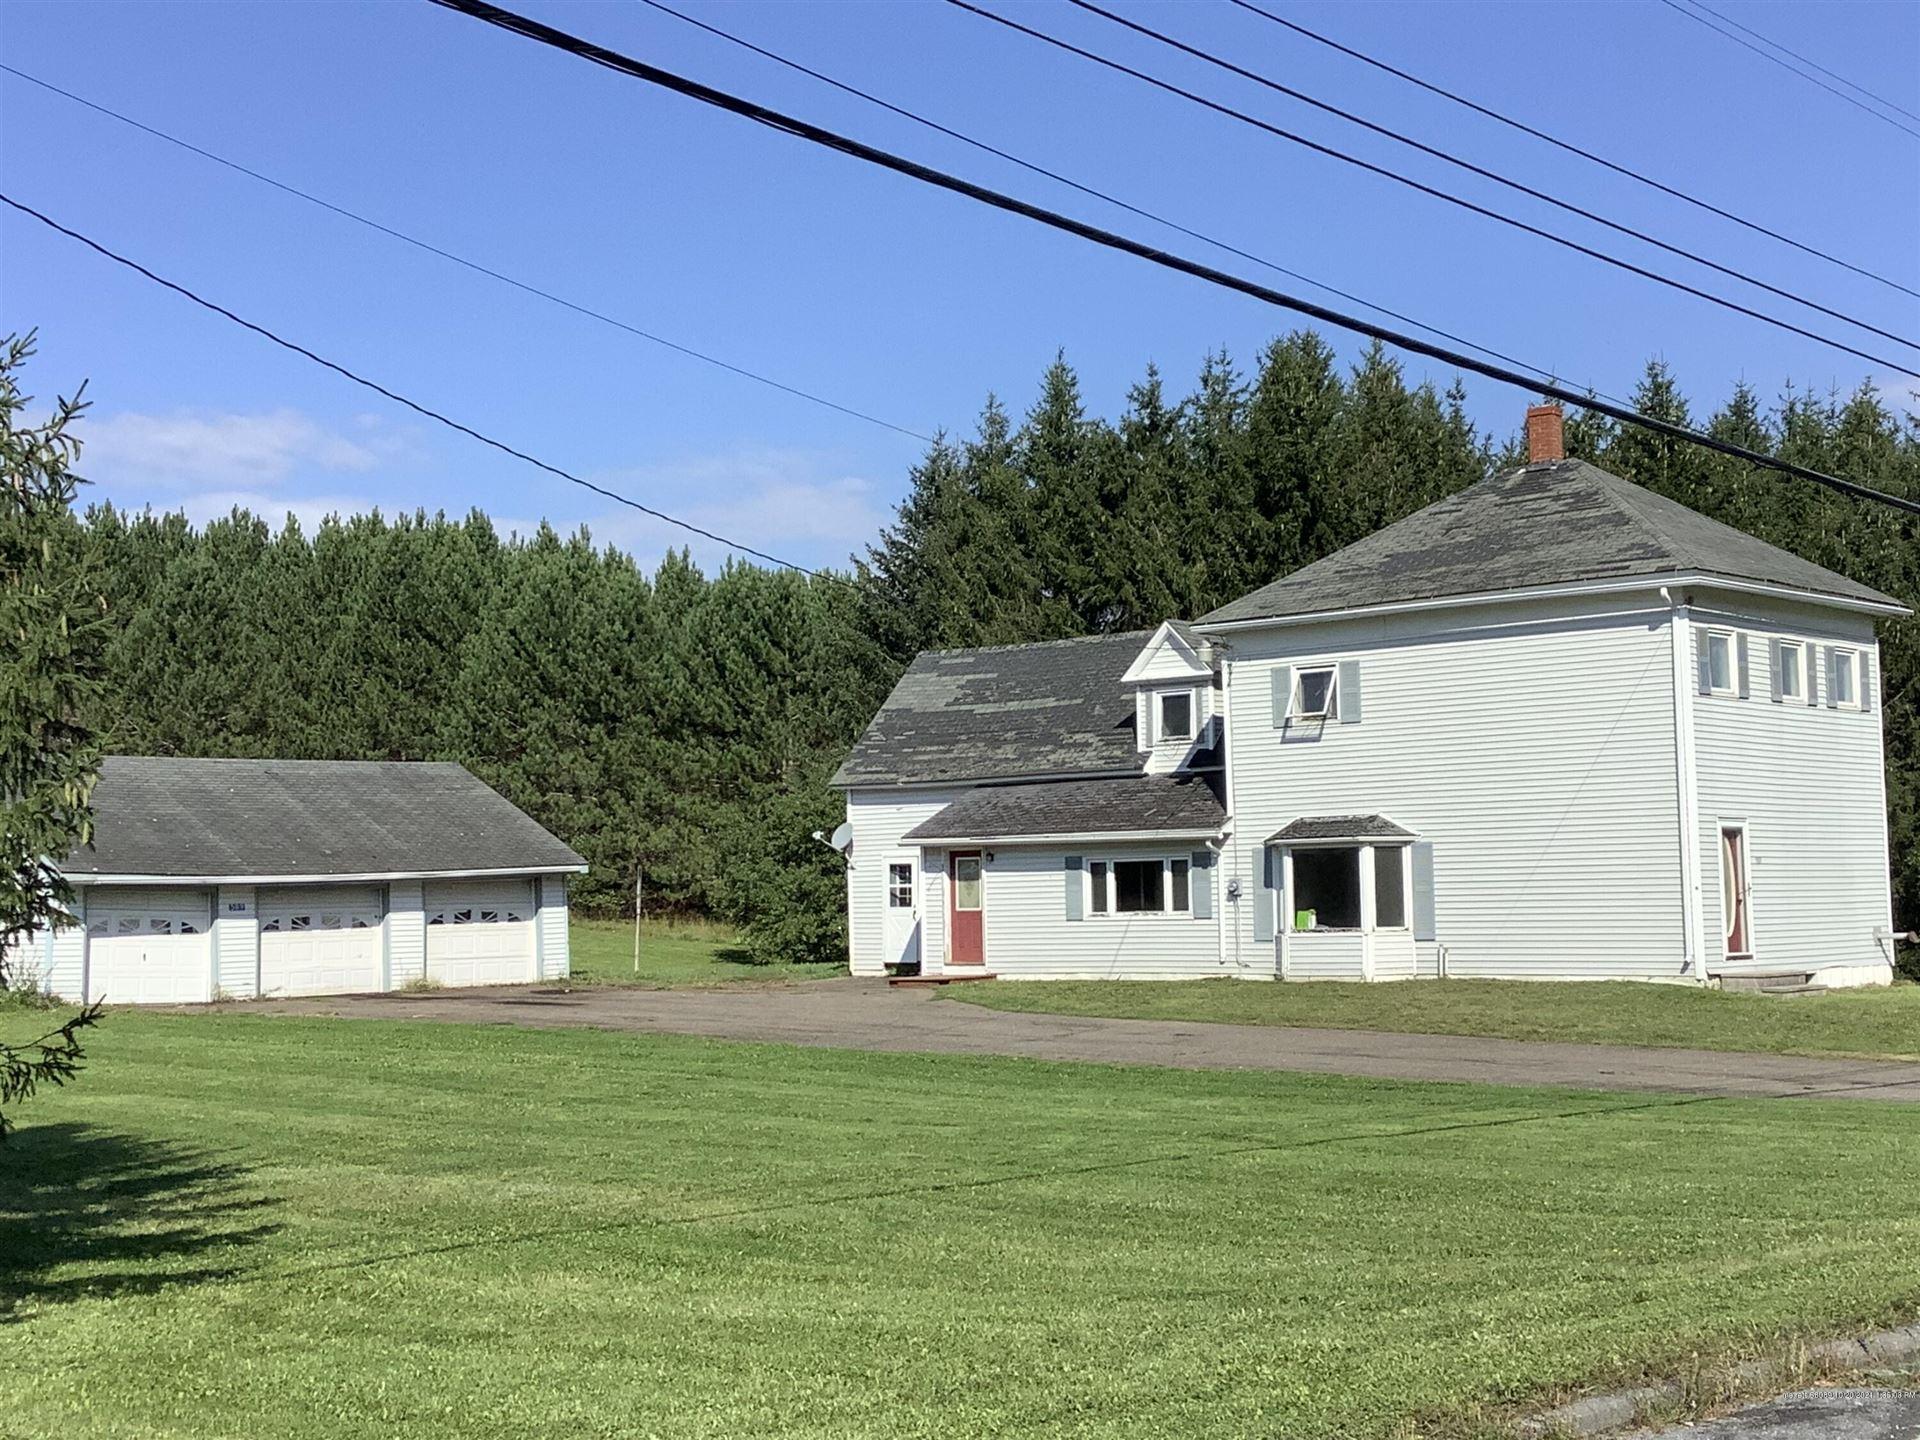 Photo of 589 Military Road, Blaine, ME 04734 (MLS # 1512563)